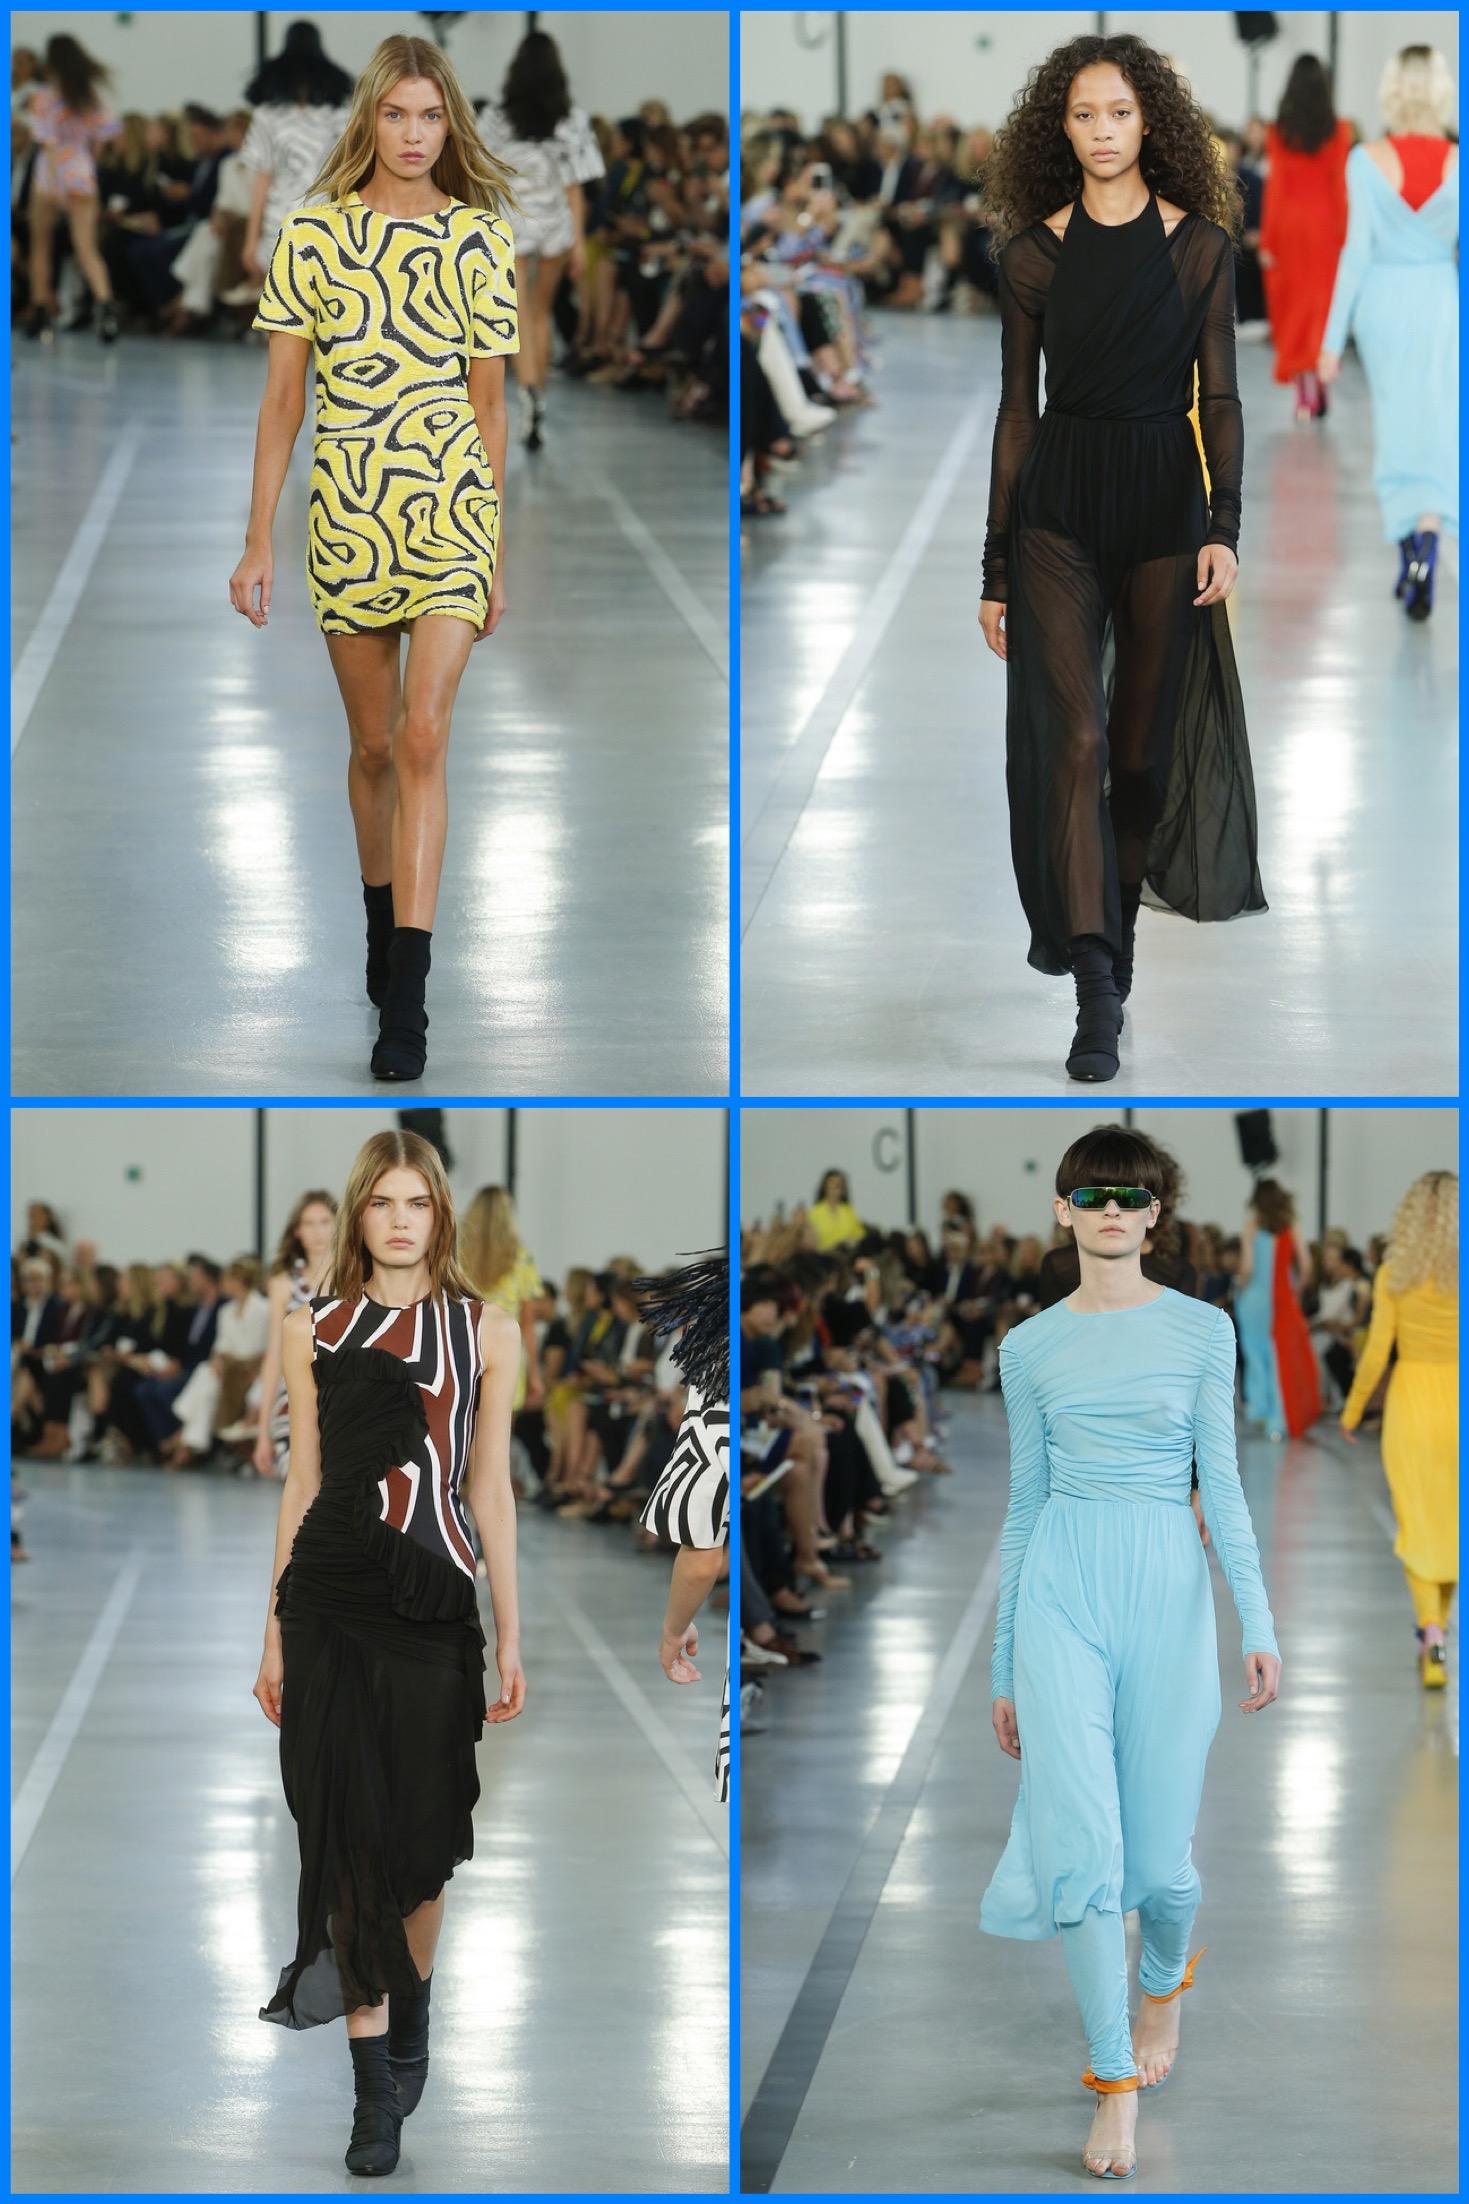 milano-fashion-week-pret-a-porter-spring-summer-2017-style-emilio-pucci